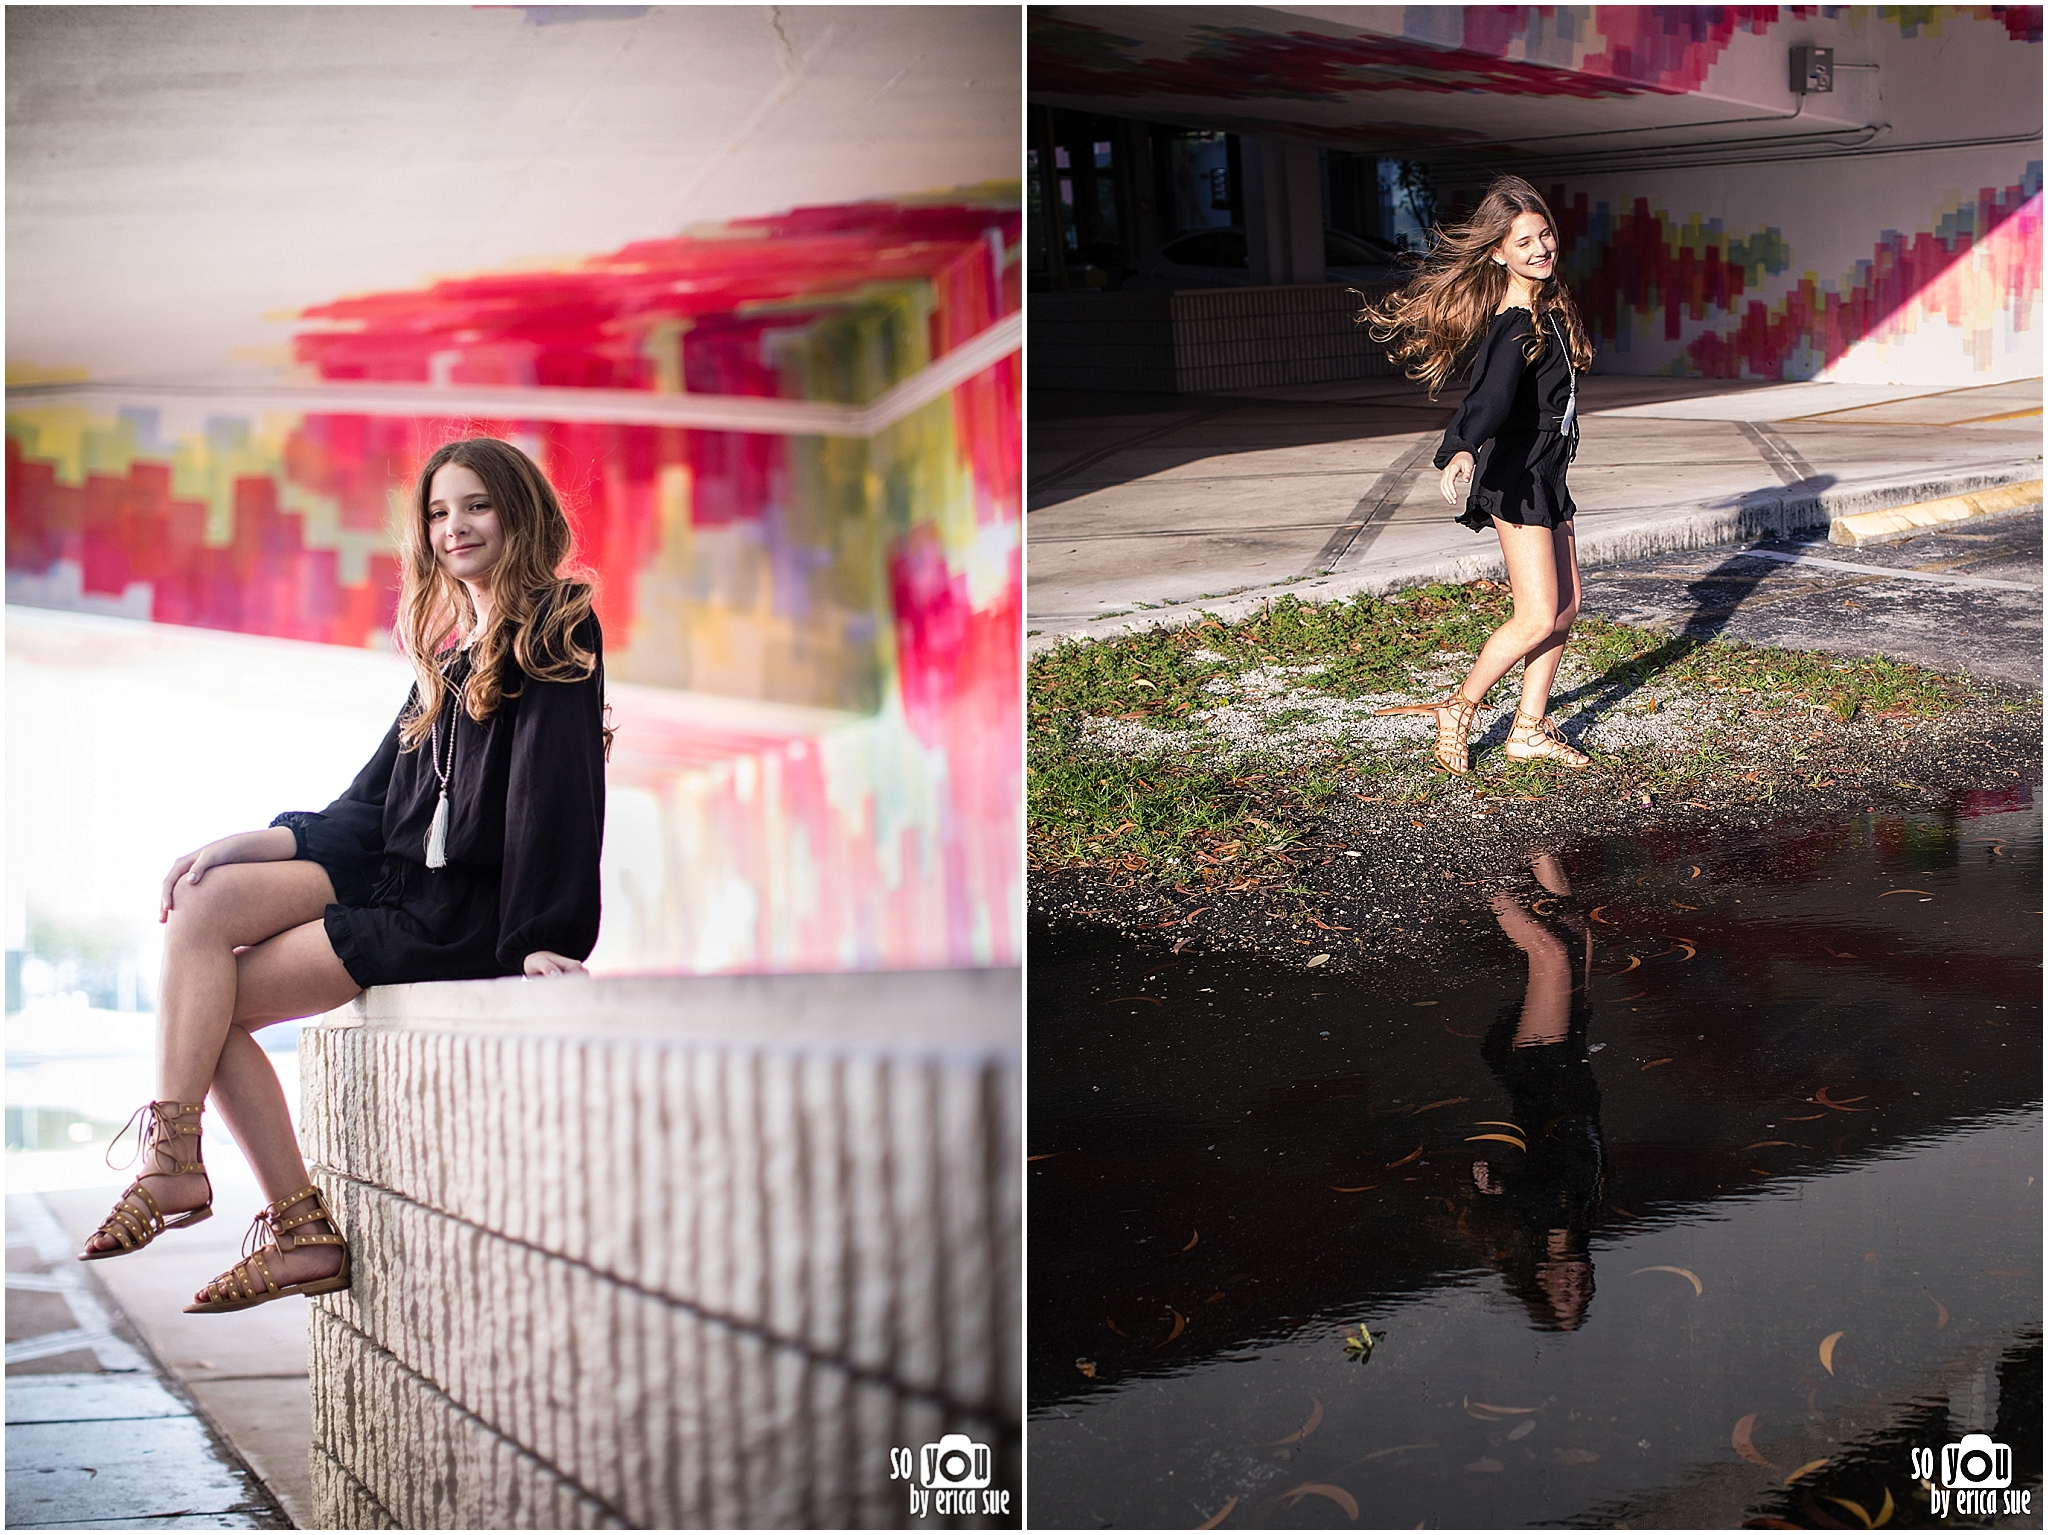 bat-mitzvah-pre-shoot-photo-session-riverwalk-downtown-ft-lauderdale-1434 (2).jpg